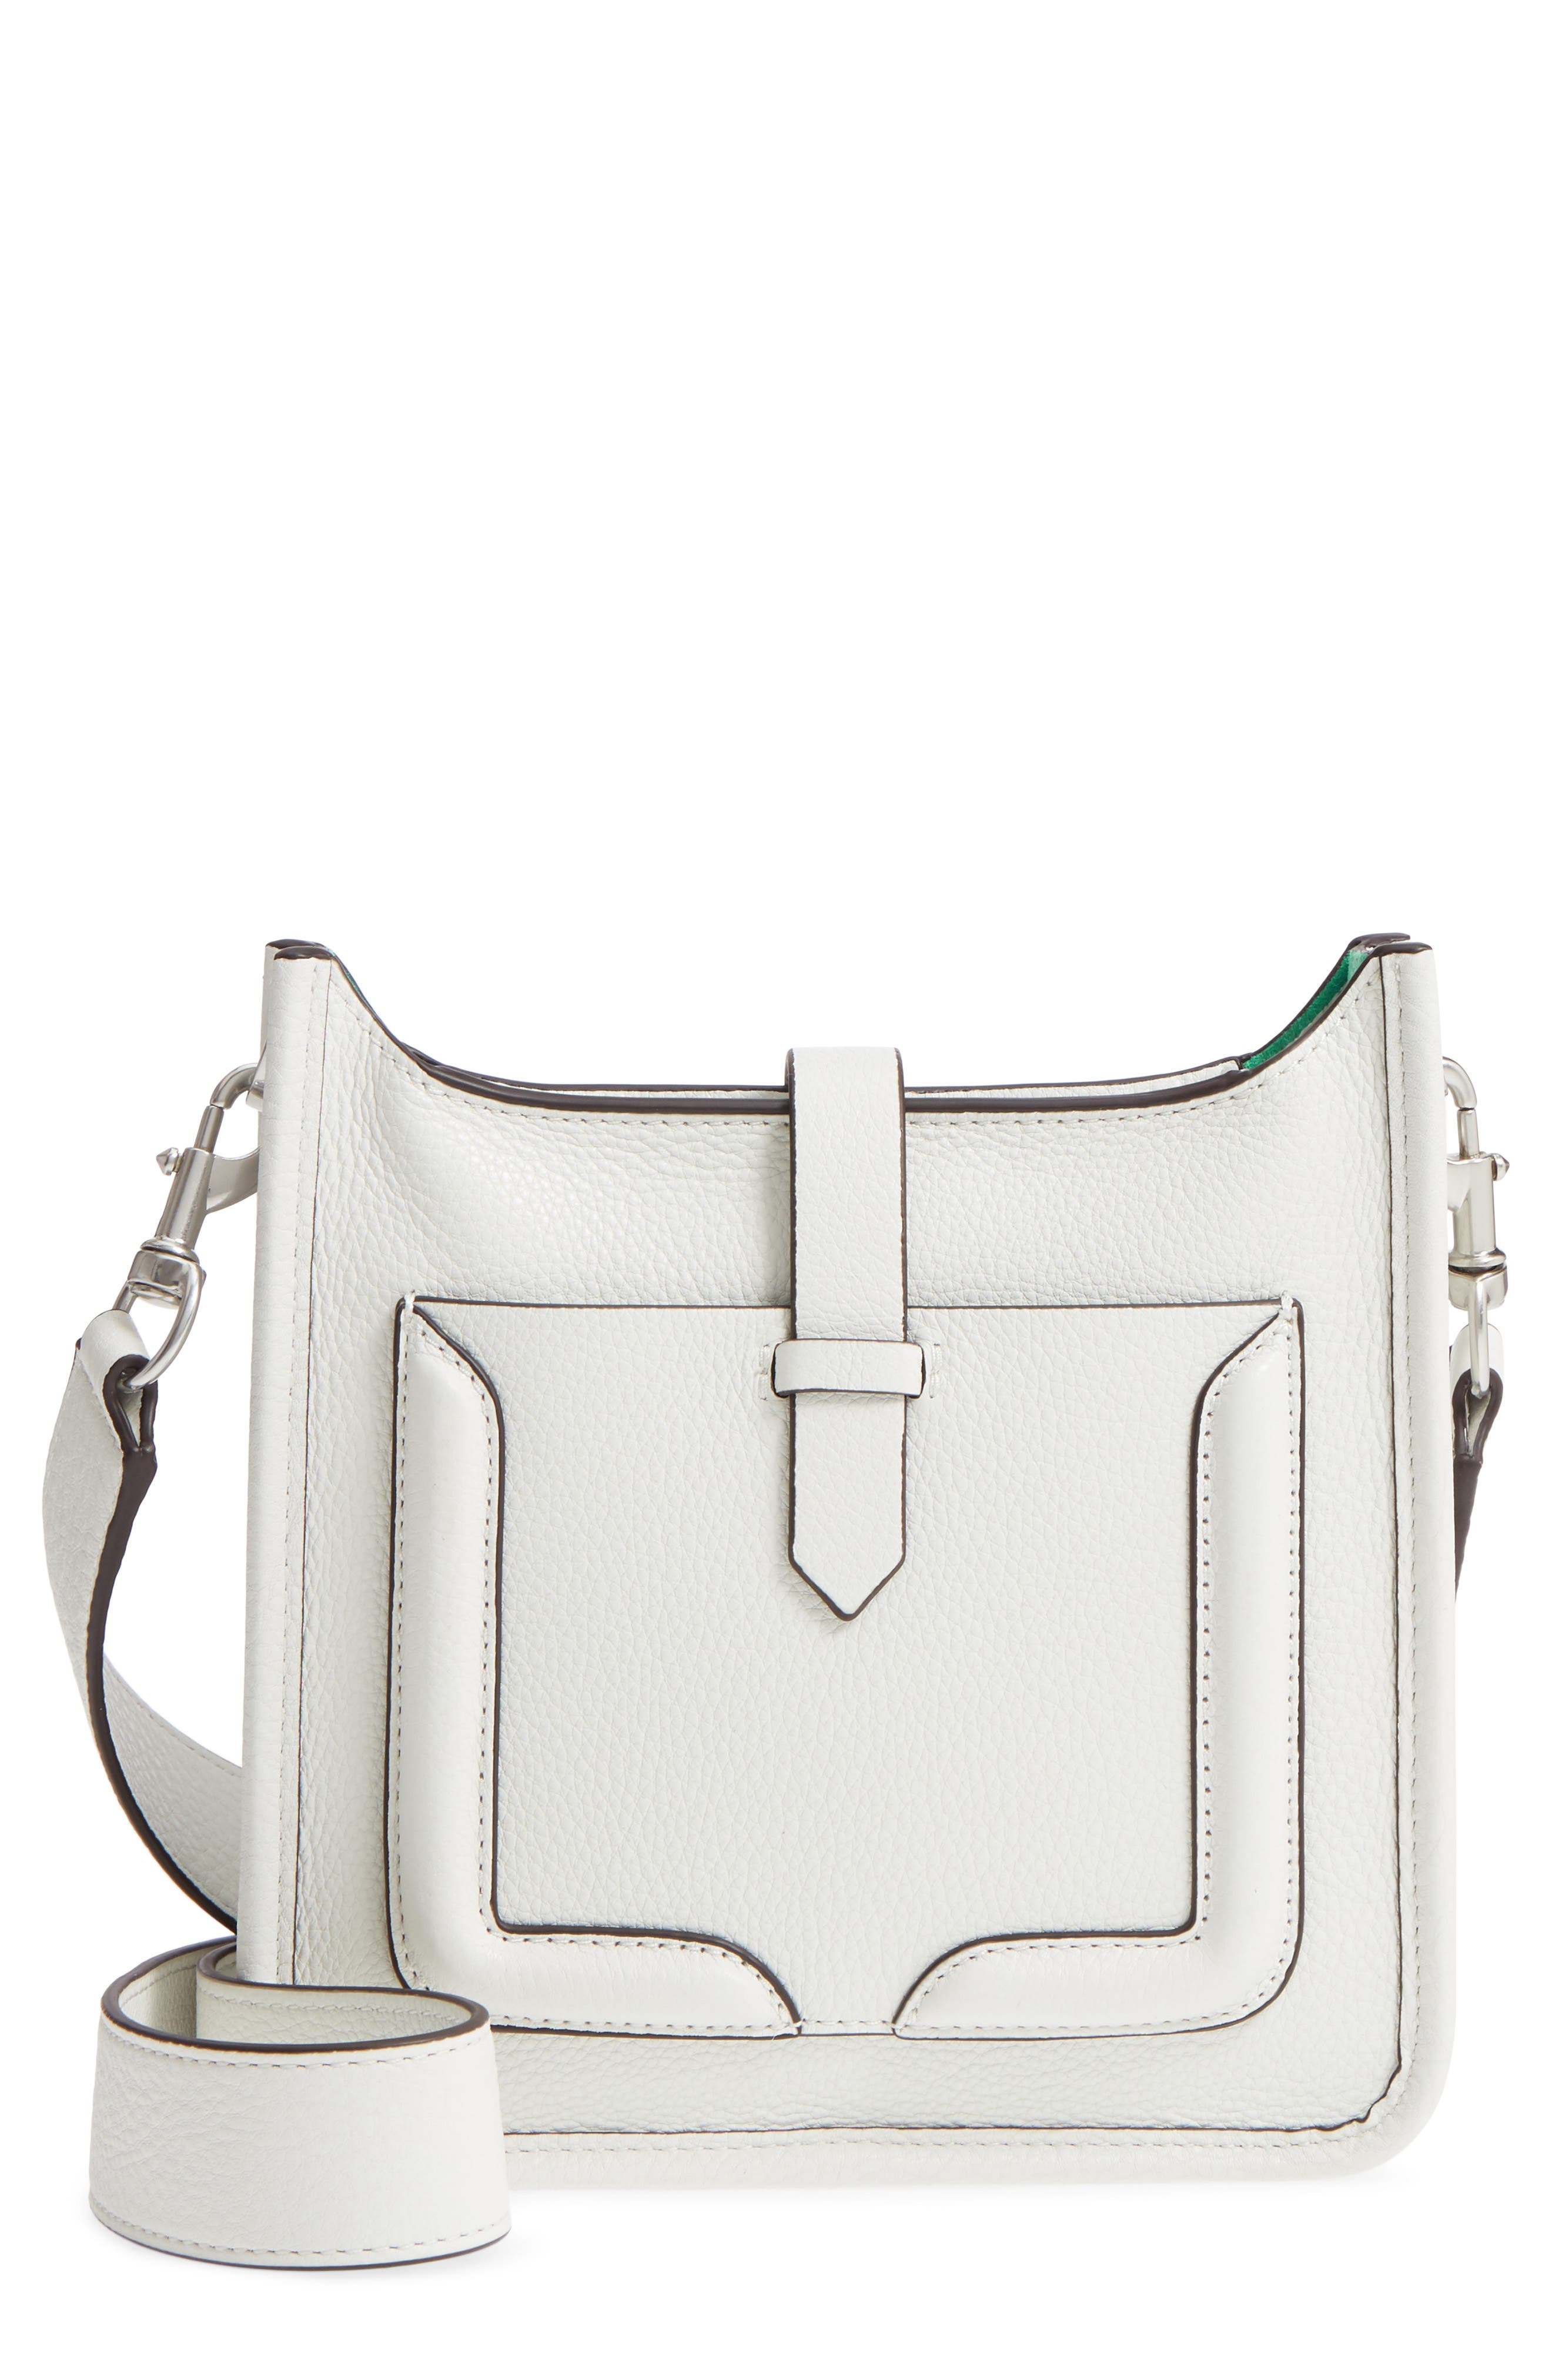 Rebecca Minkoff Mini Unlined Leather Feed Bag